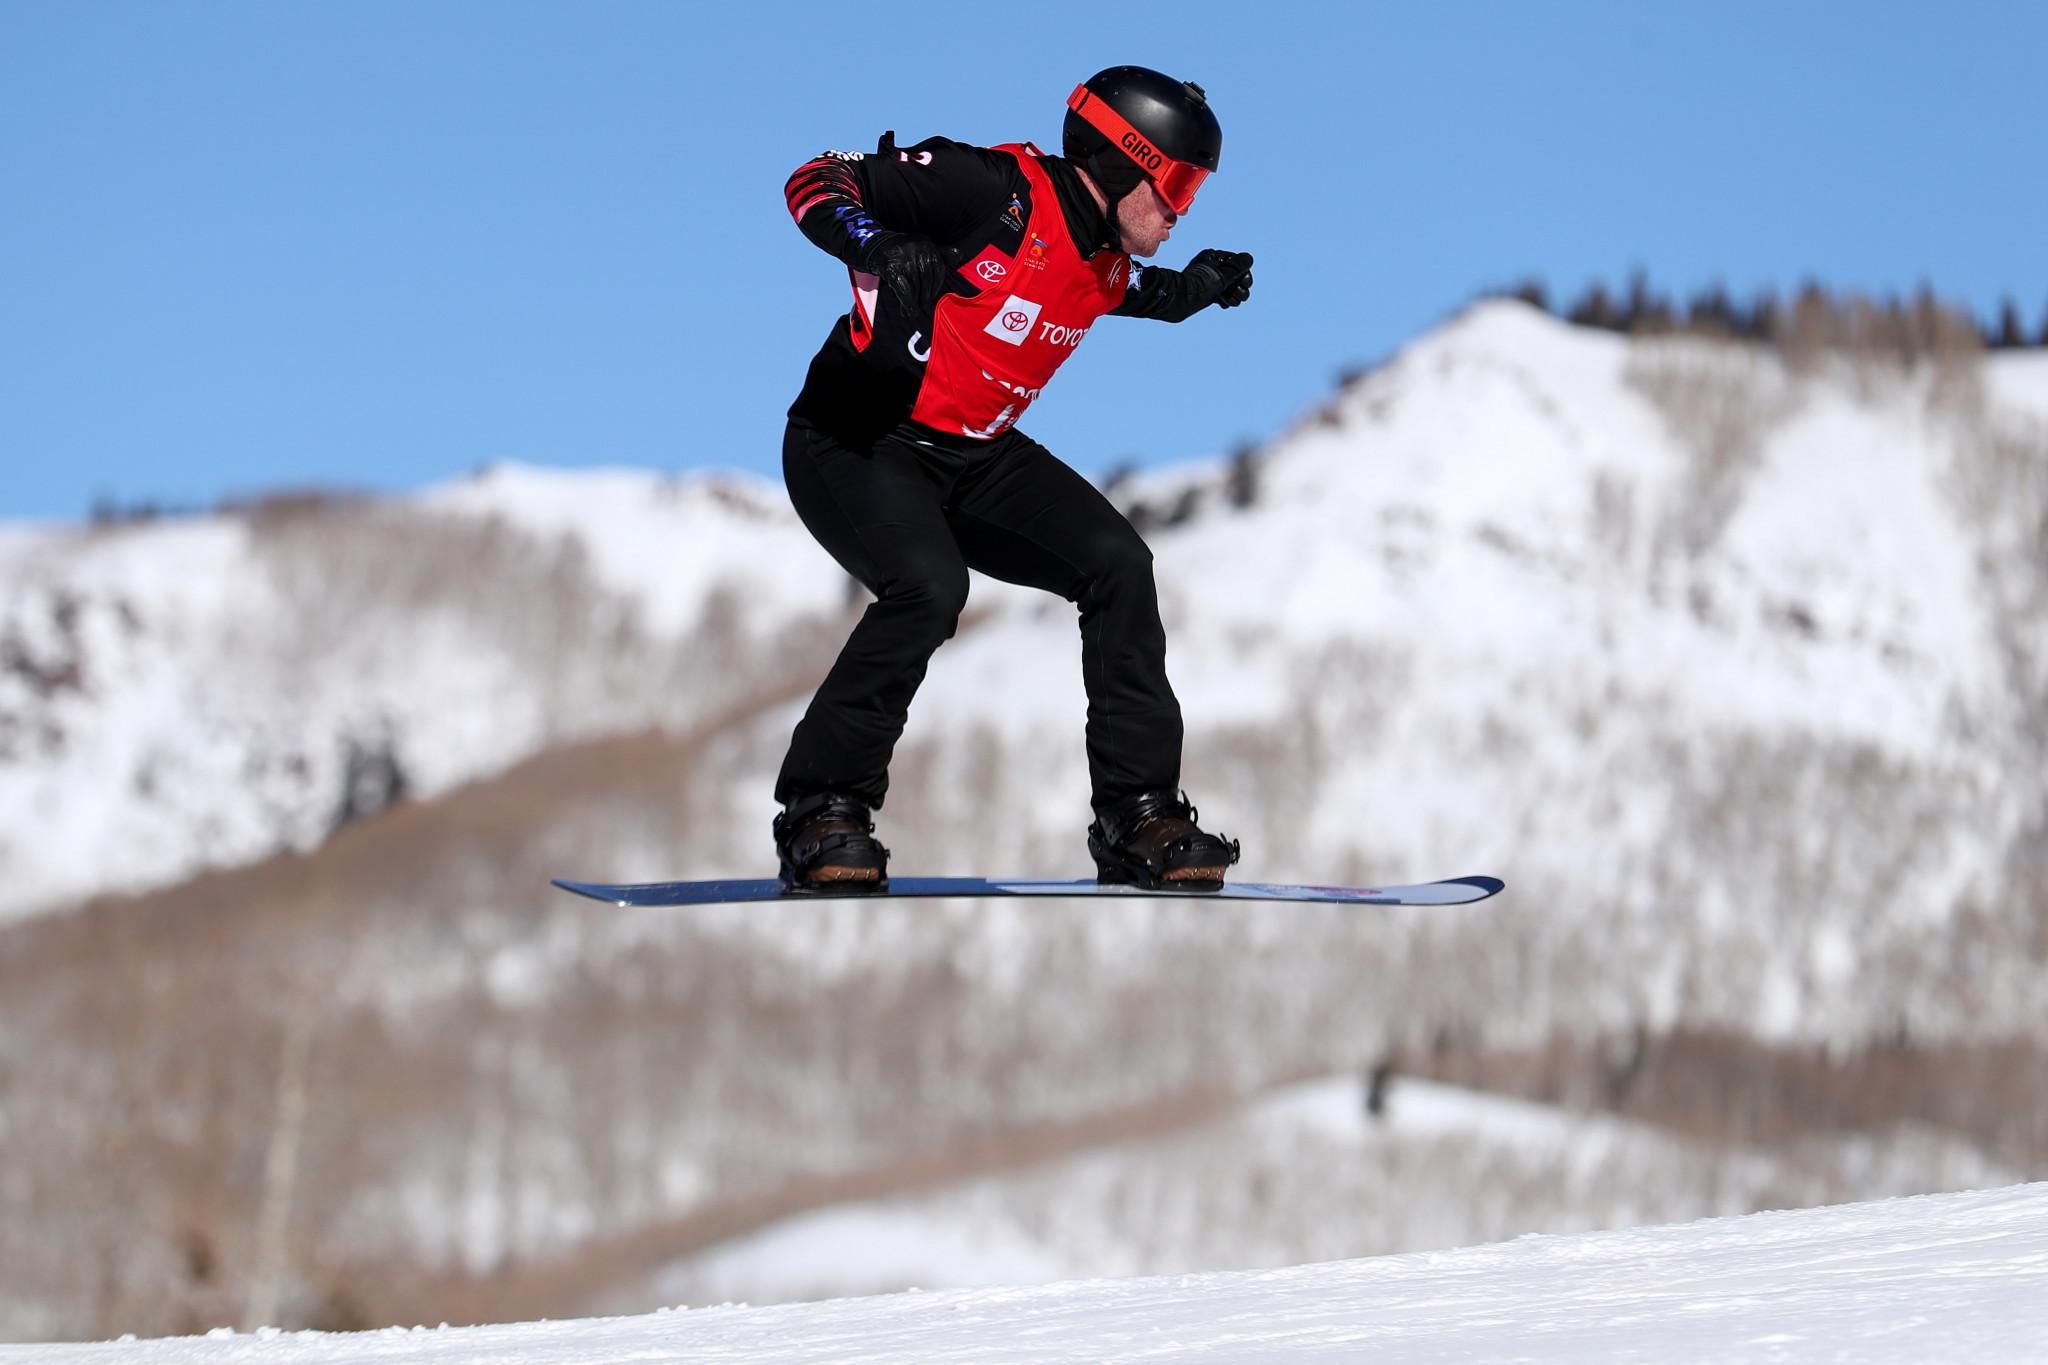 Mick Dierdorff will lead the men's snowboard cross team ©Getty Images